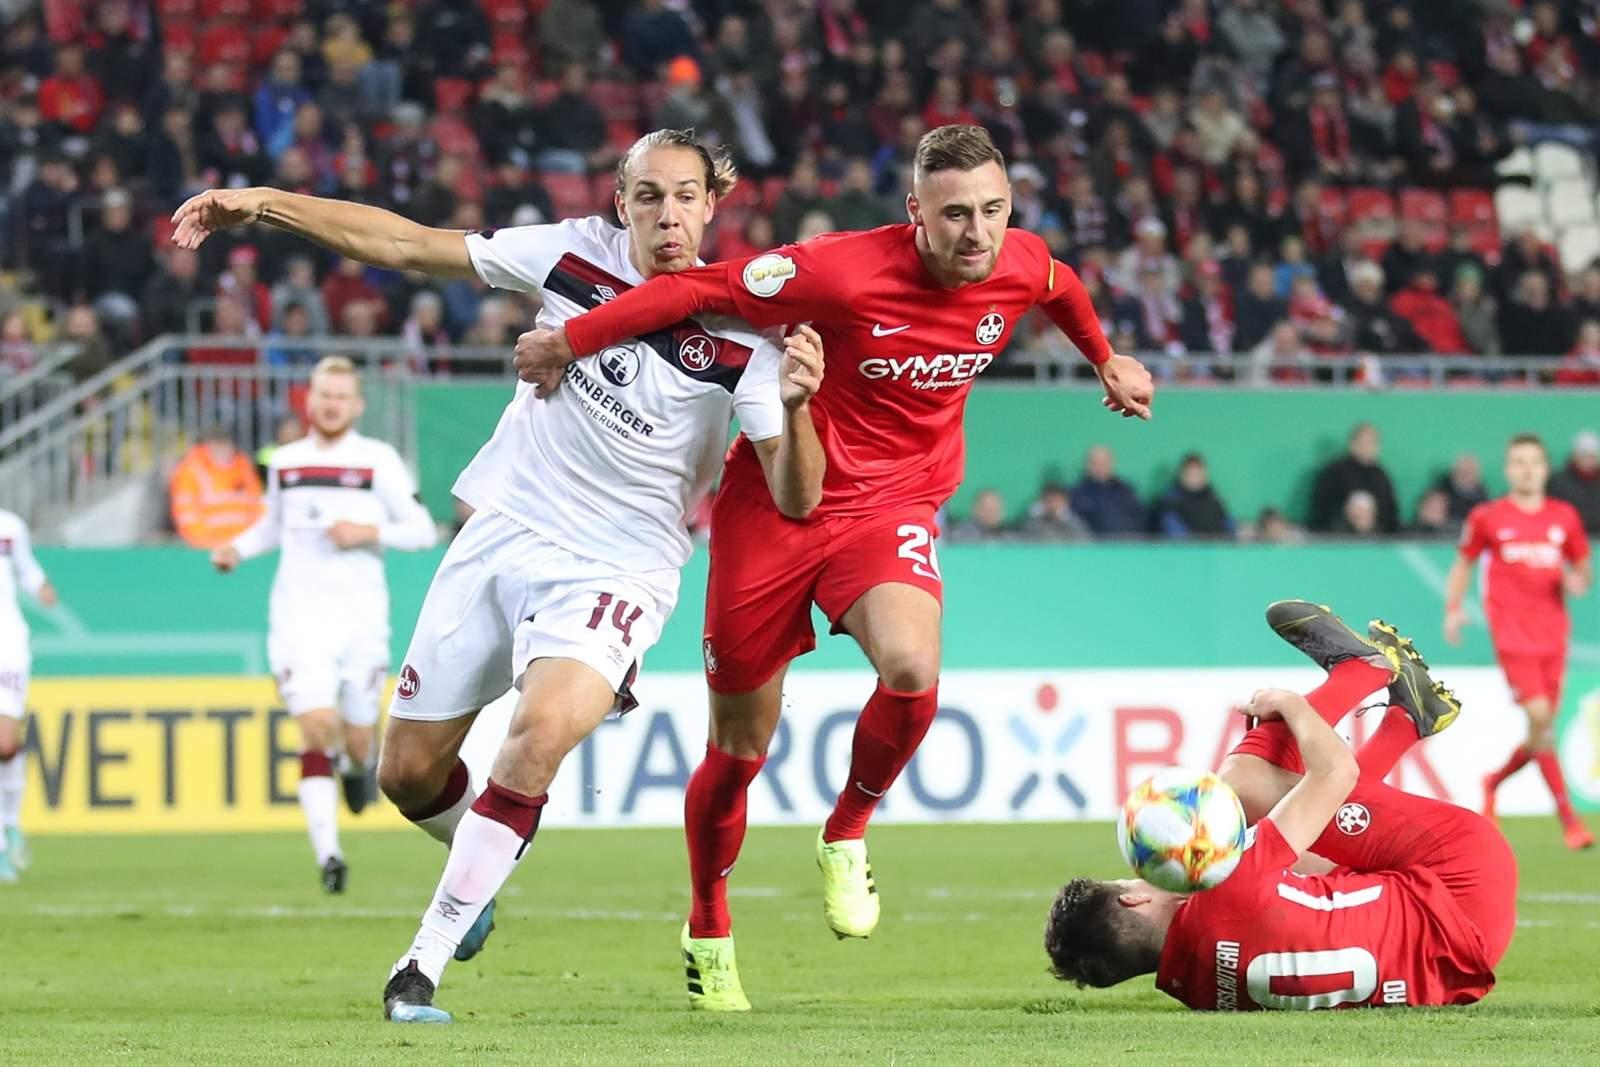 Lukas Gottwalt gewinnt bei Pokalspiel FCK vs Nürnberg Zweikampf gegen Michael Frey